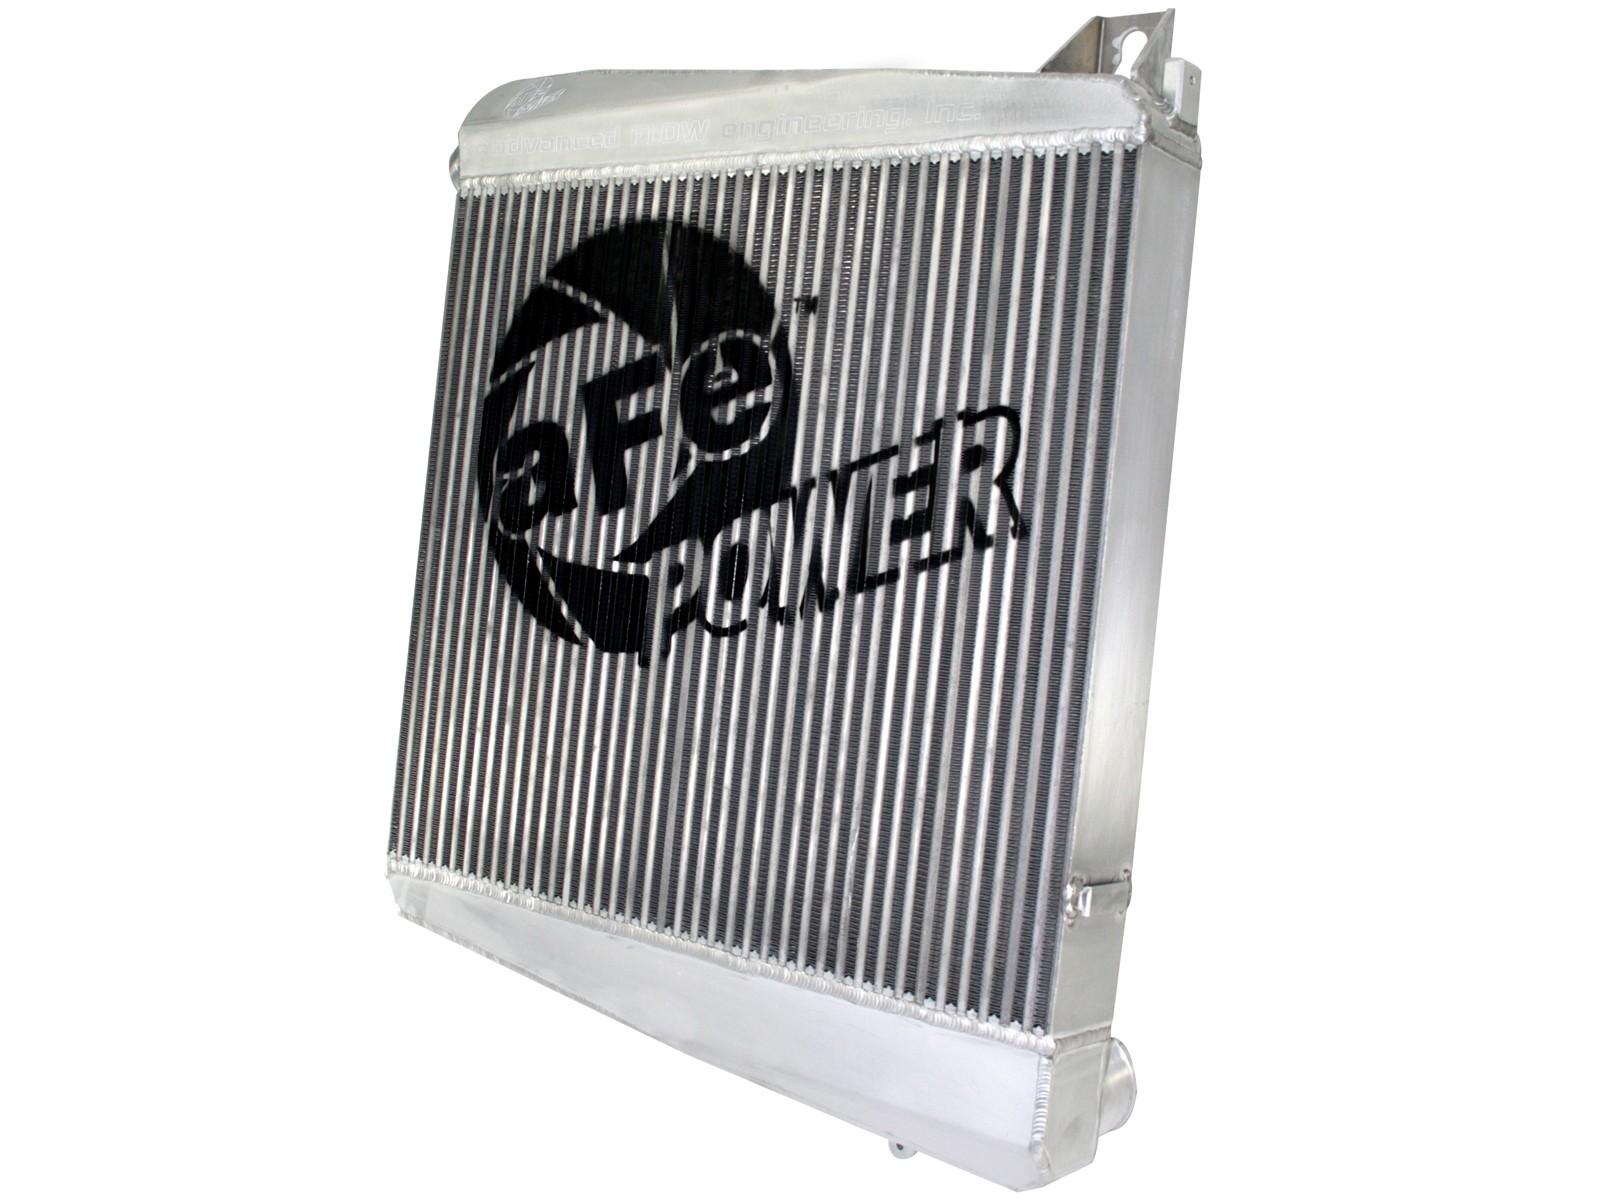 aFe POWER 46-20071 BladeRunner GT Series Intercooler